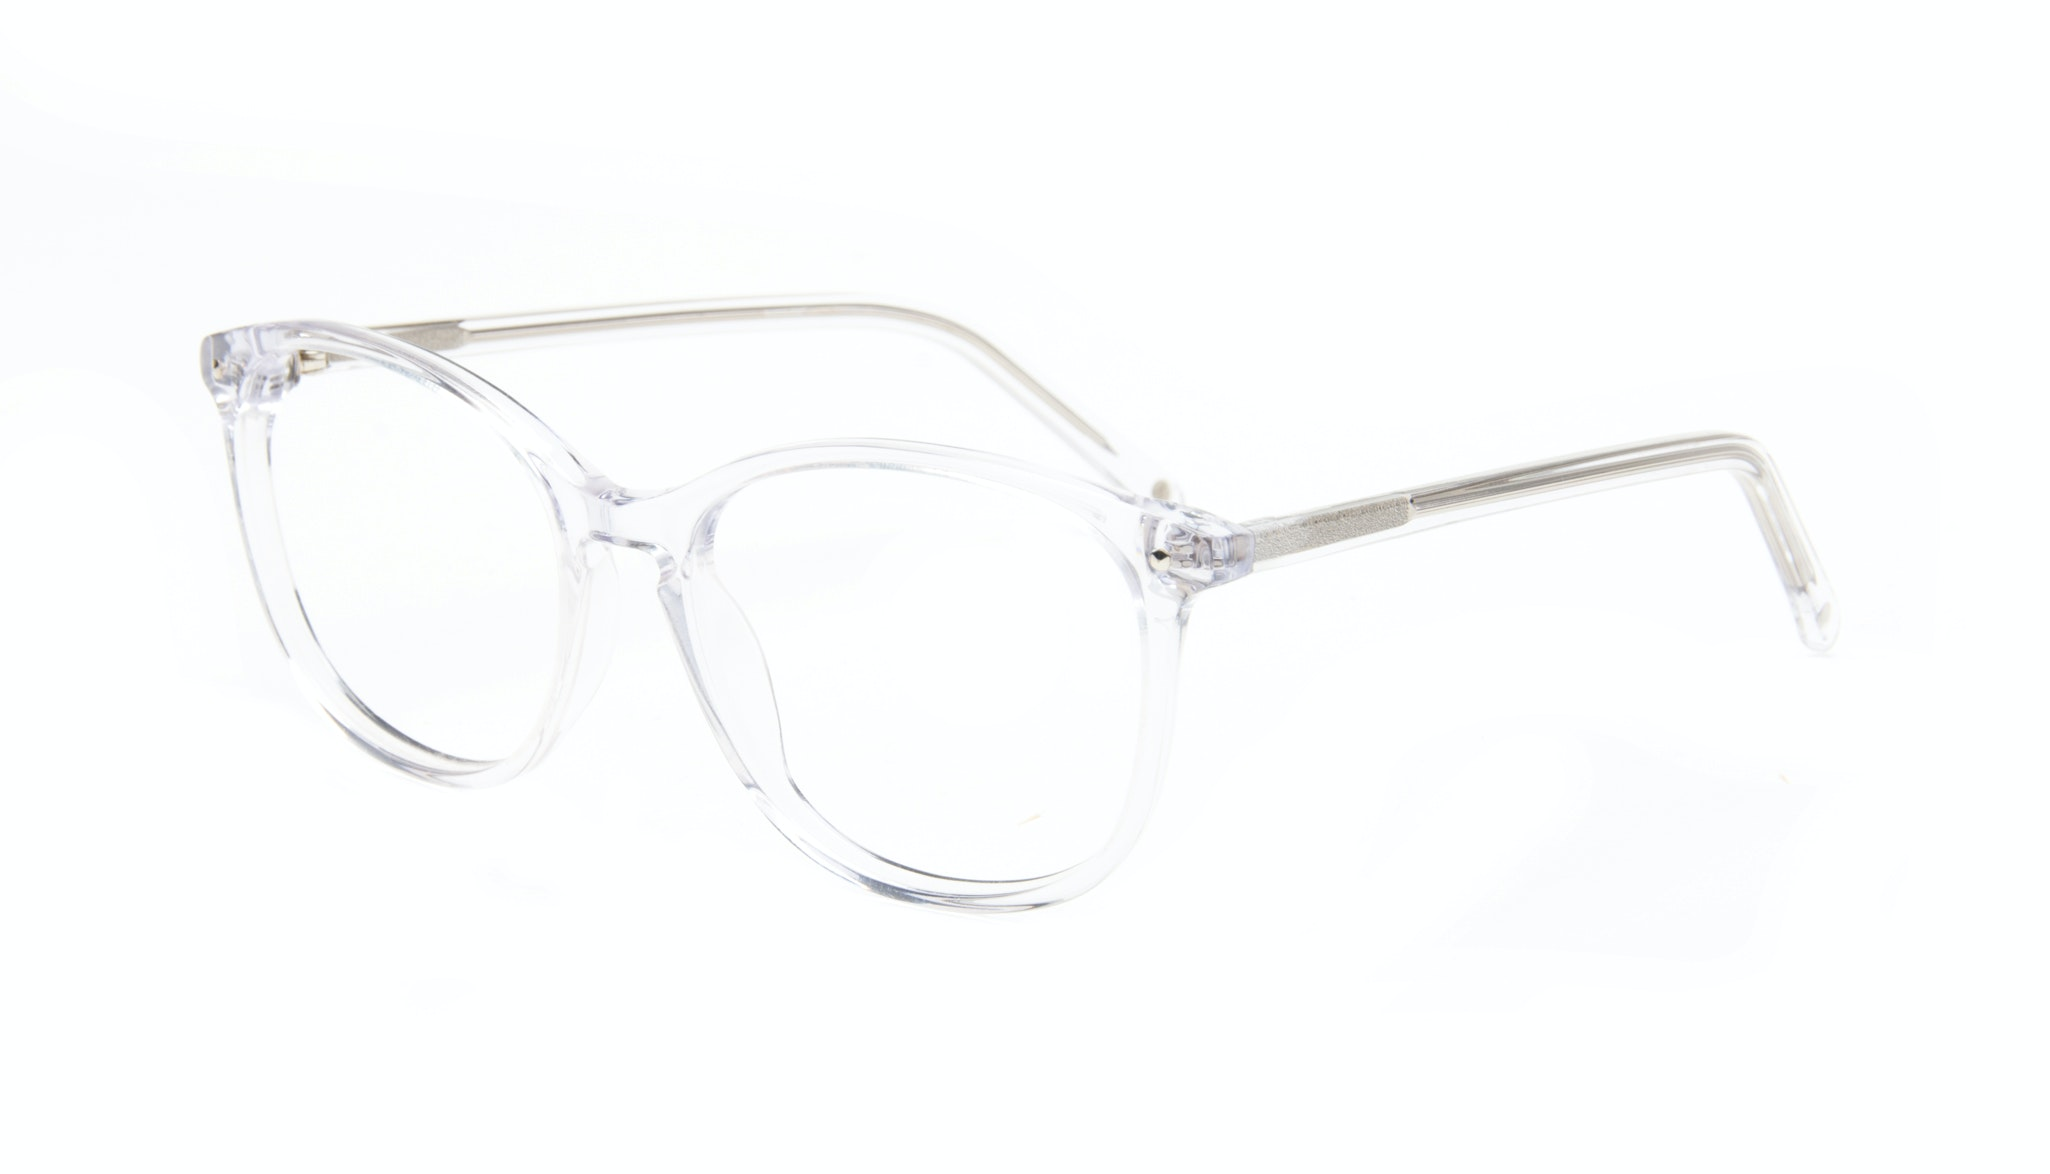 Affordable Fashion Glasses Rectangle Round Eyeglasses Women Nadine Water Tilt